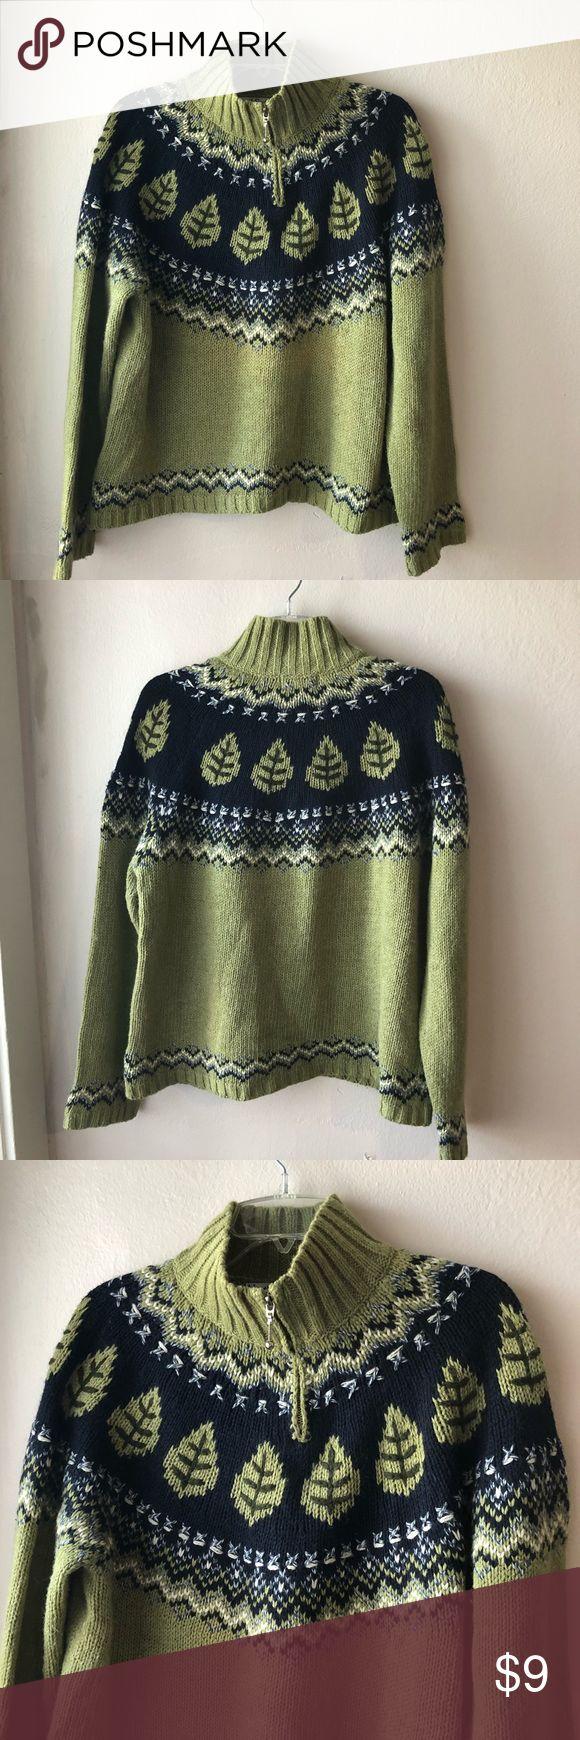 Green Zip up sweater. Women's size Large North Style women's Green Zip Up Sweater. Women's size Large. New condition north style Sweaters Crew & Scoop Necks